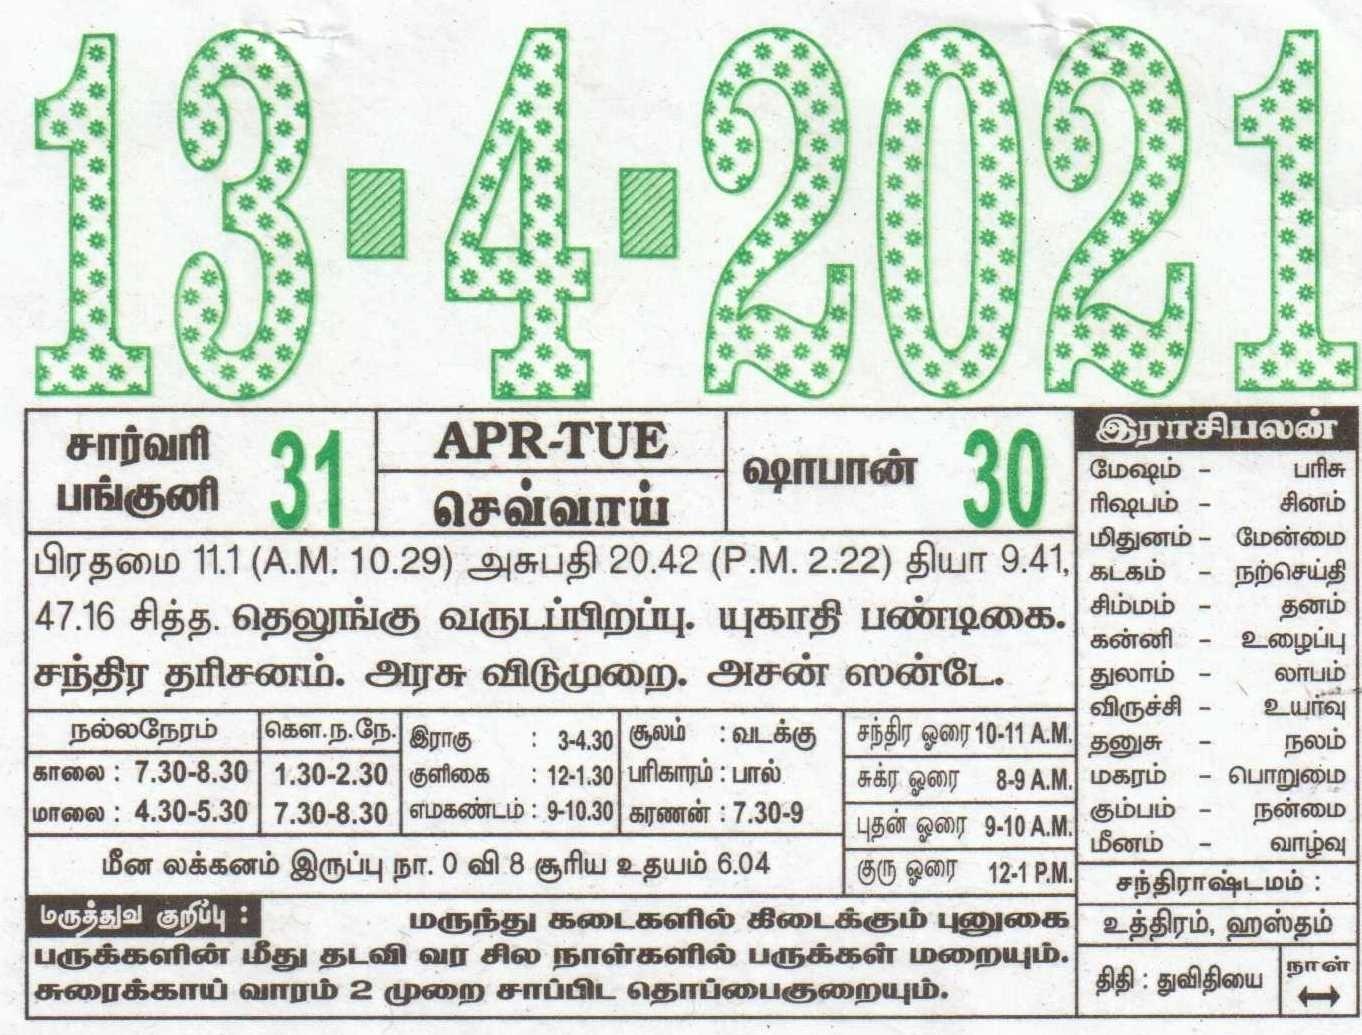 13-04-2021 Daily Calendar | Date 13 , January Daily Tear Off Calendar | Daily Panchangam Rasi Palan Marriage Dates In June 2021 Hindu Calendar